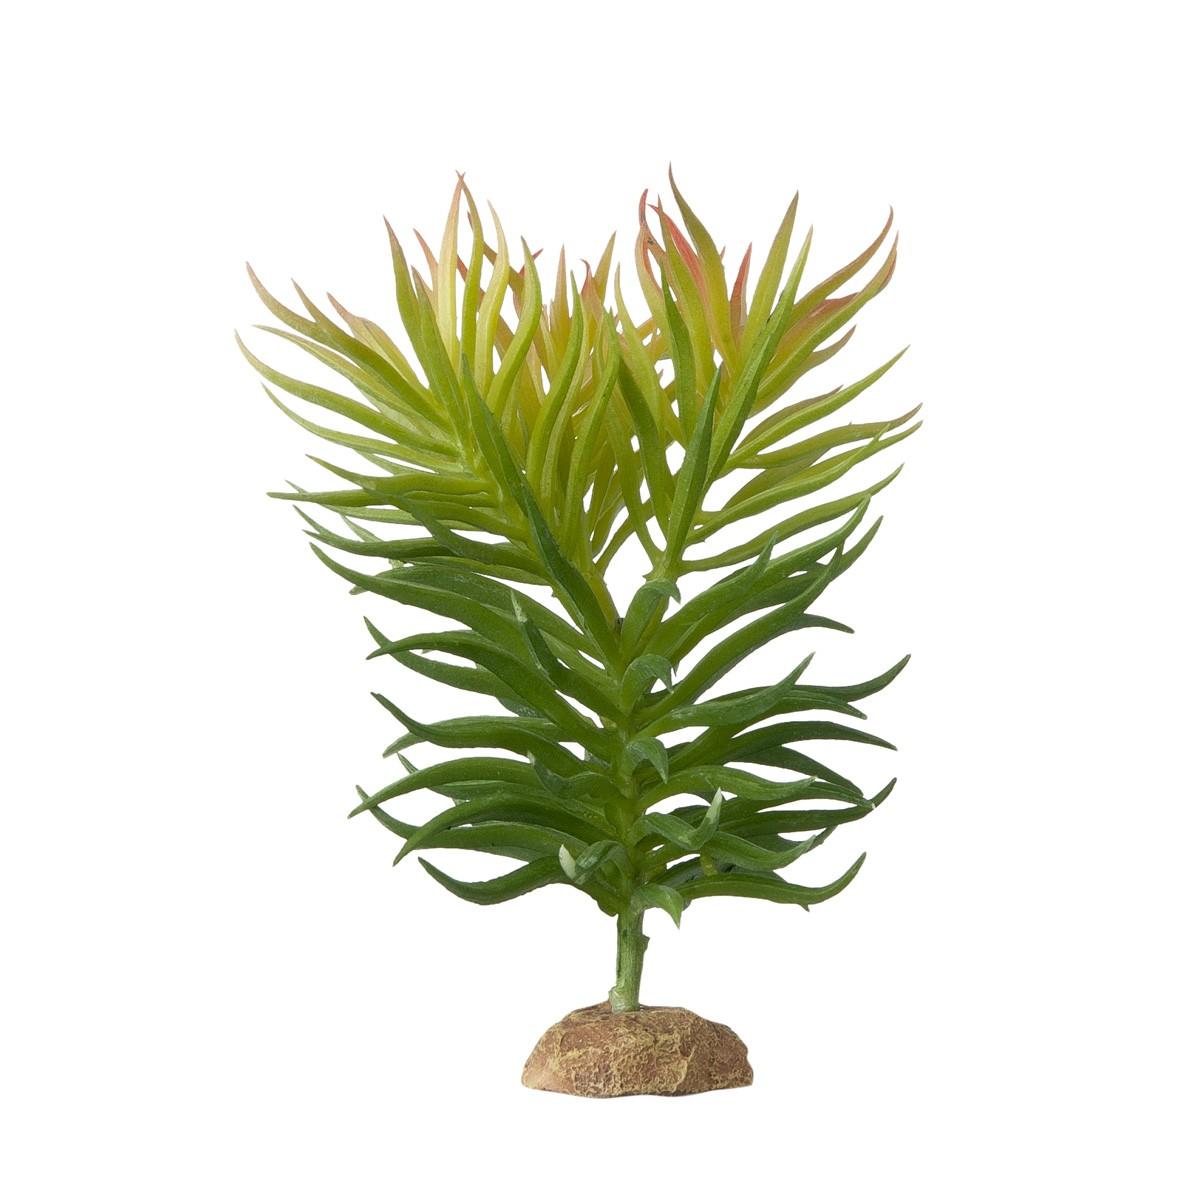 Decorazione Per Acquari Pianta Succulenta